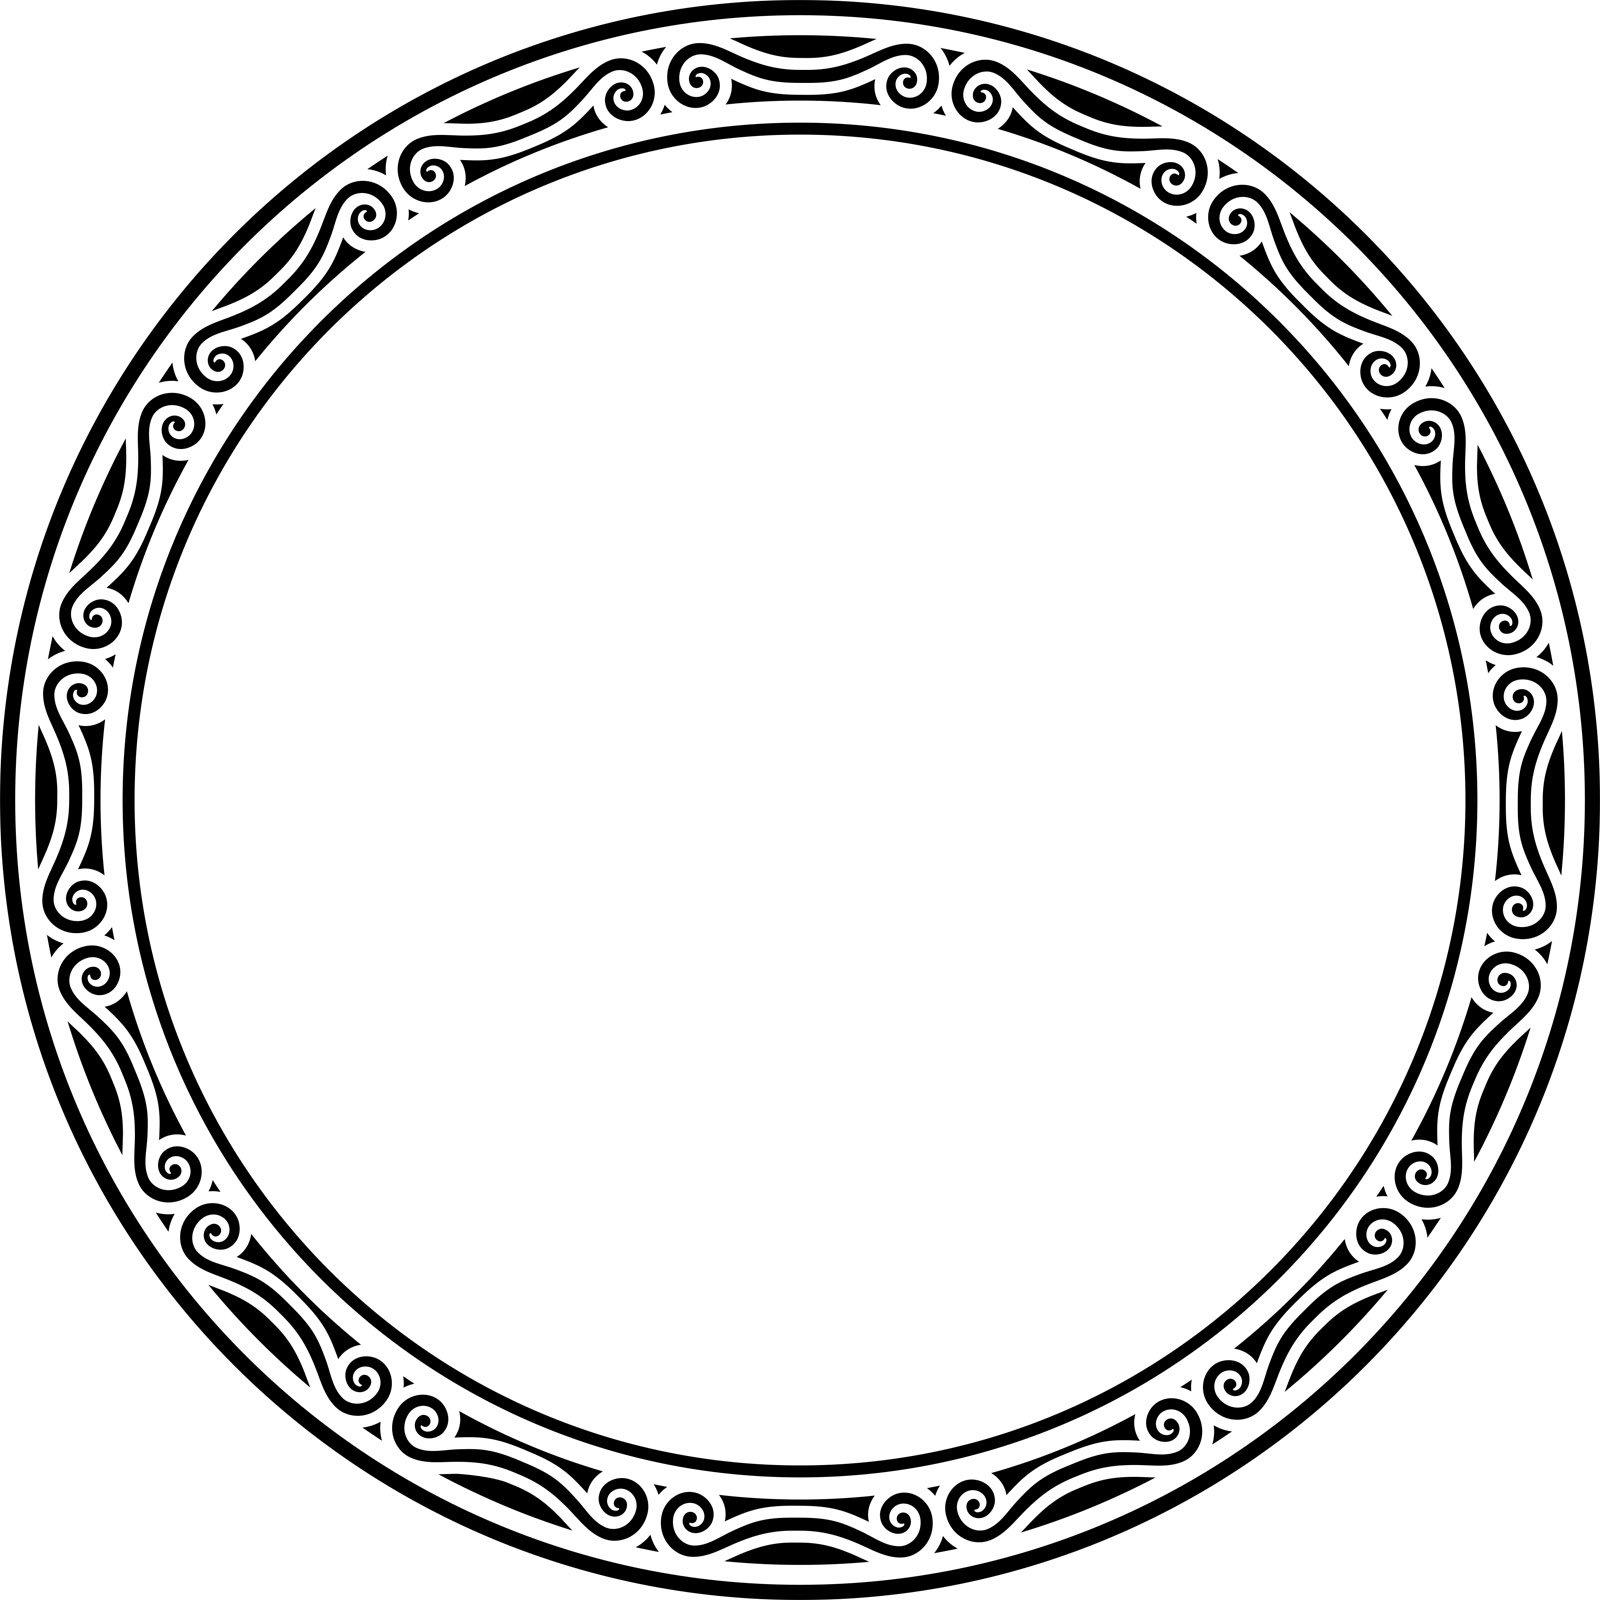 Circular Frame Wall Sticker Decal